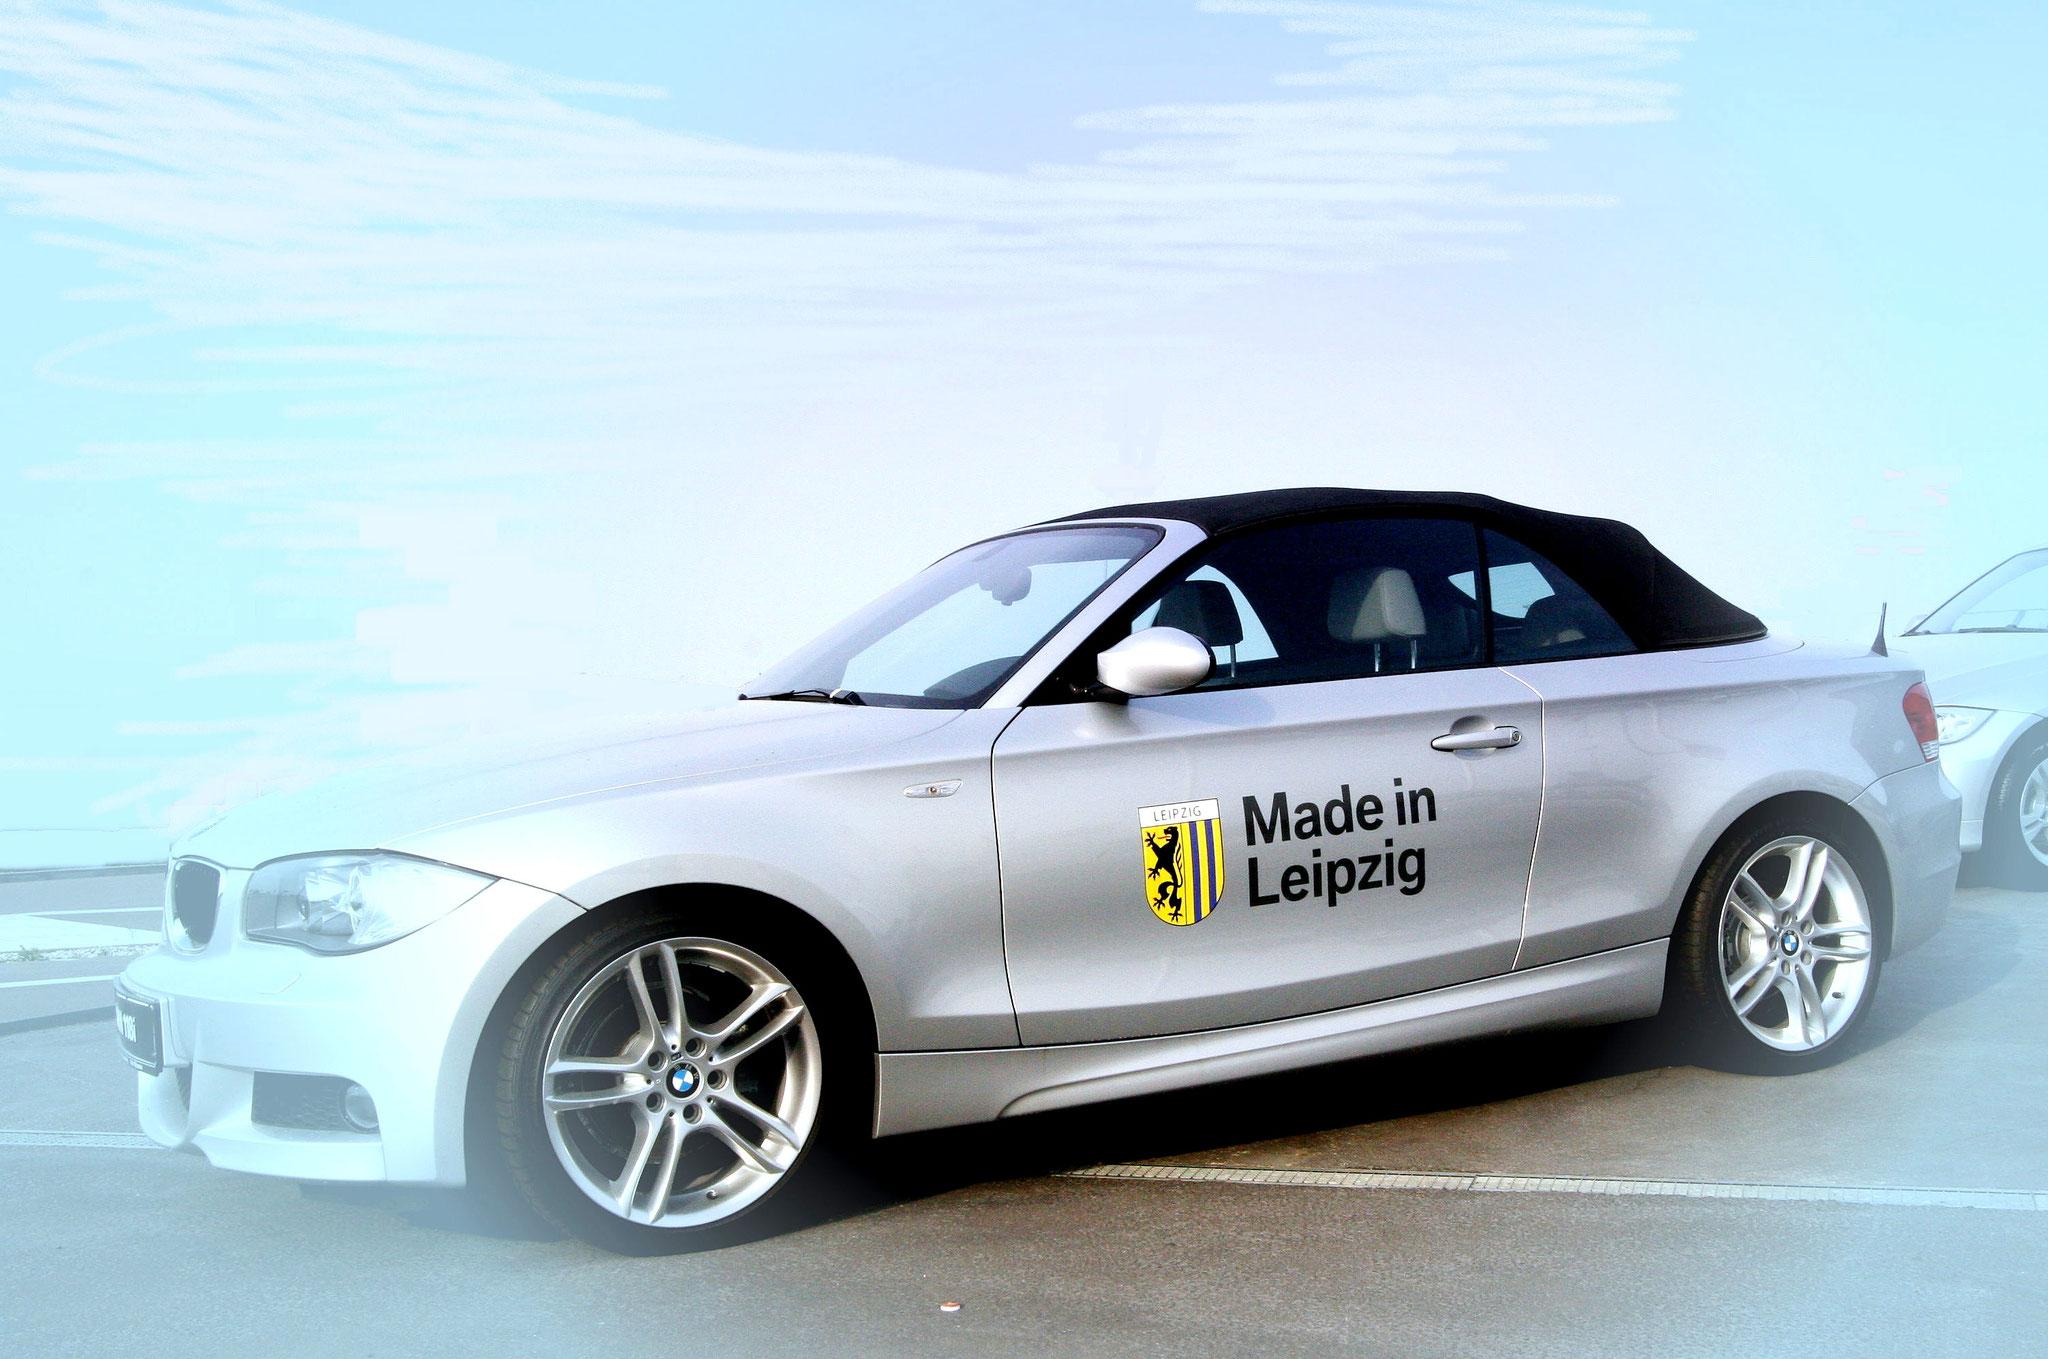 3er BMW - Made in Leipzig